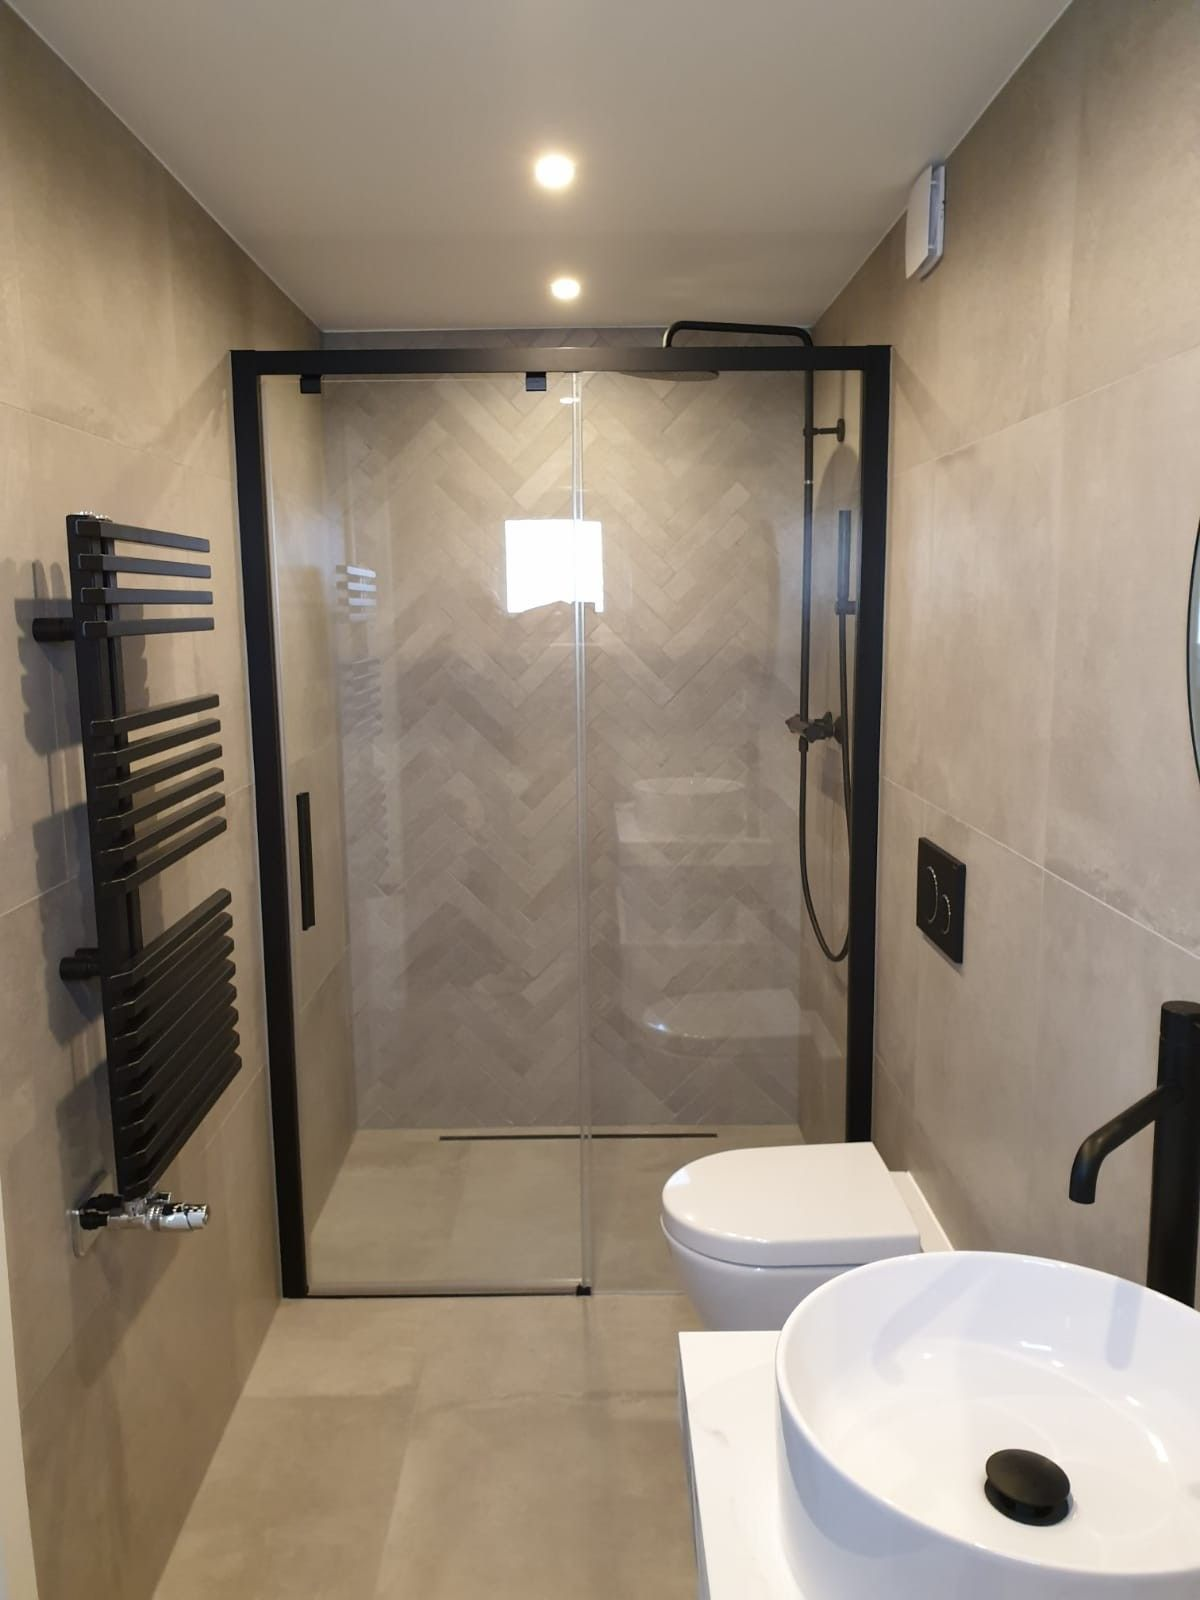 Design Bathroom 2020 Black Salle De Bain Design Douche A L Italienne Robinetterie Noire Vasque Posee Cera En 2020 Salle De Bain Design Salle De Bain Douche Italienne